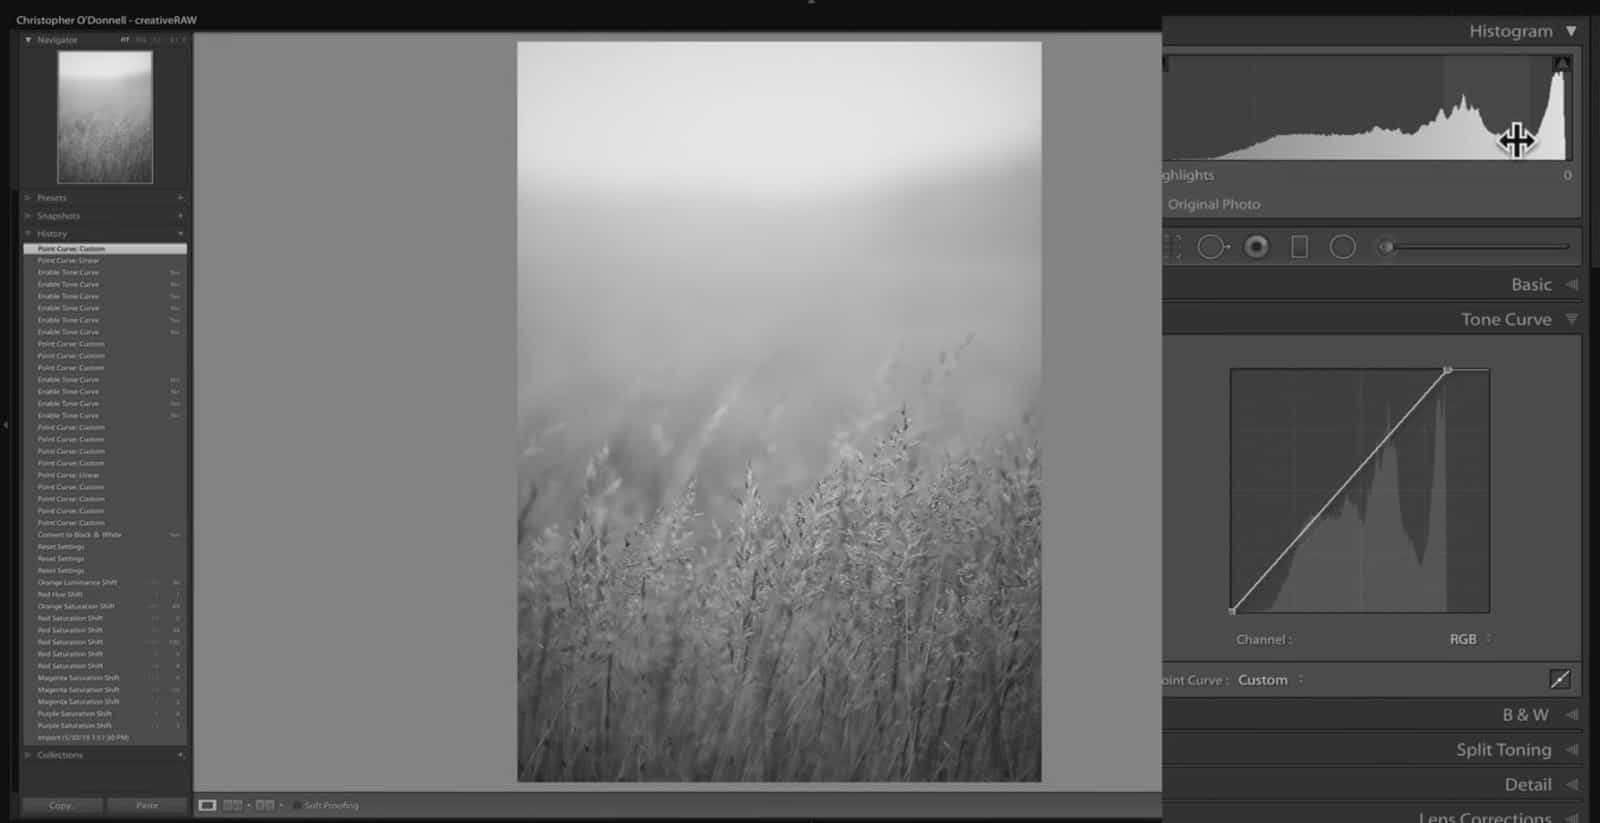 How to Make Image Whiter - Photoshop